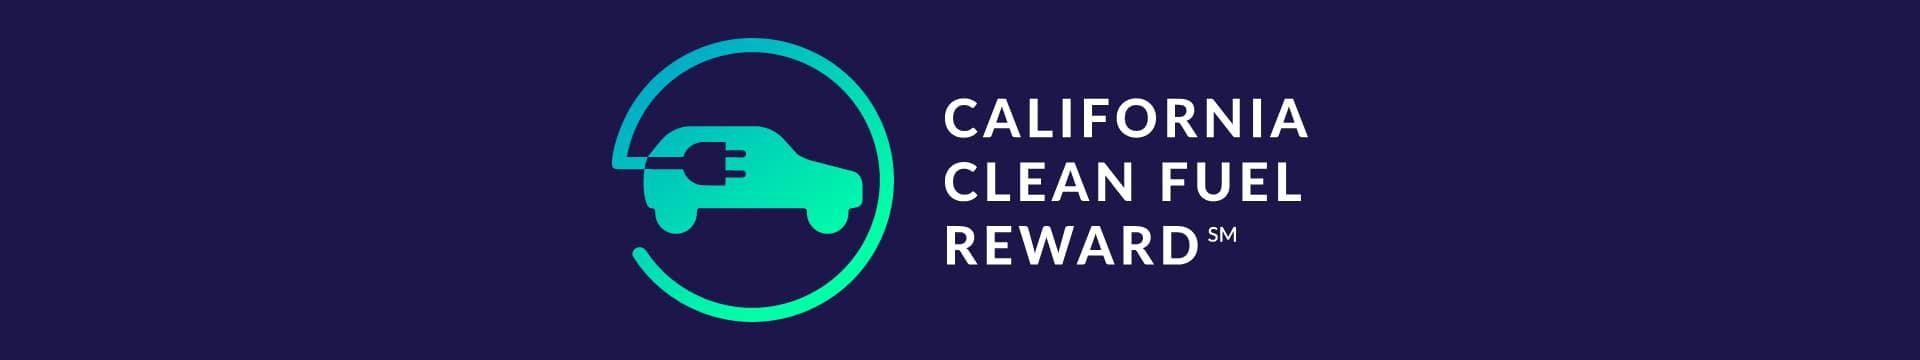 California Clean Fuel Reward Program at Timmons Volkswagen